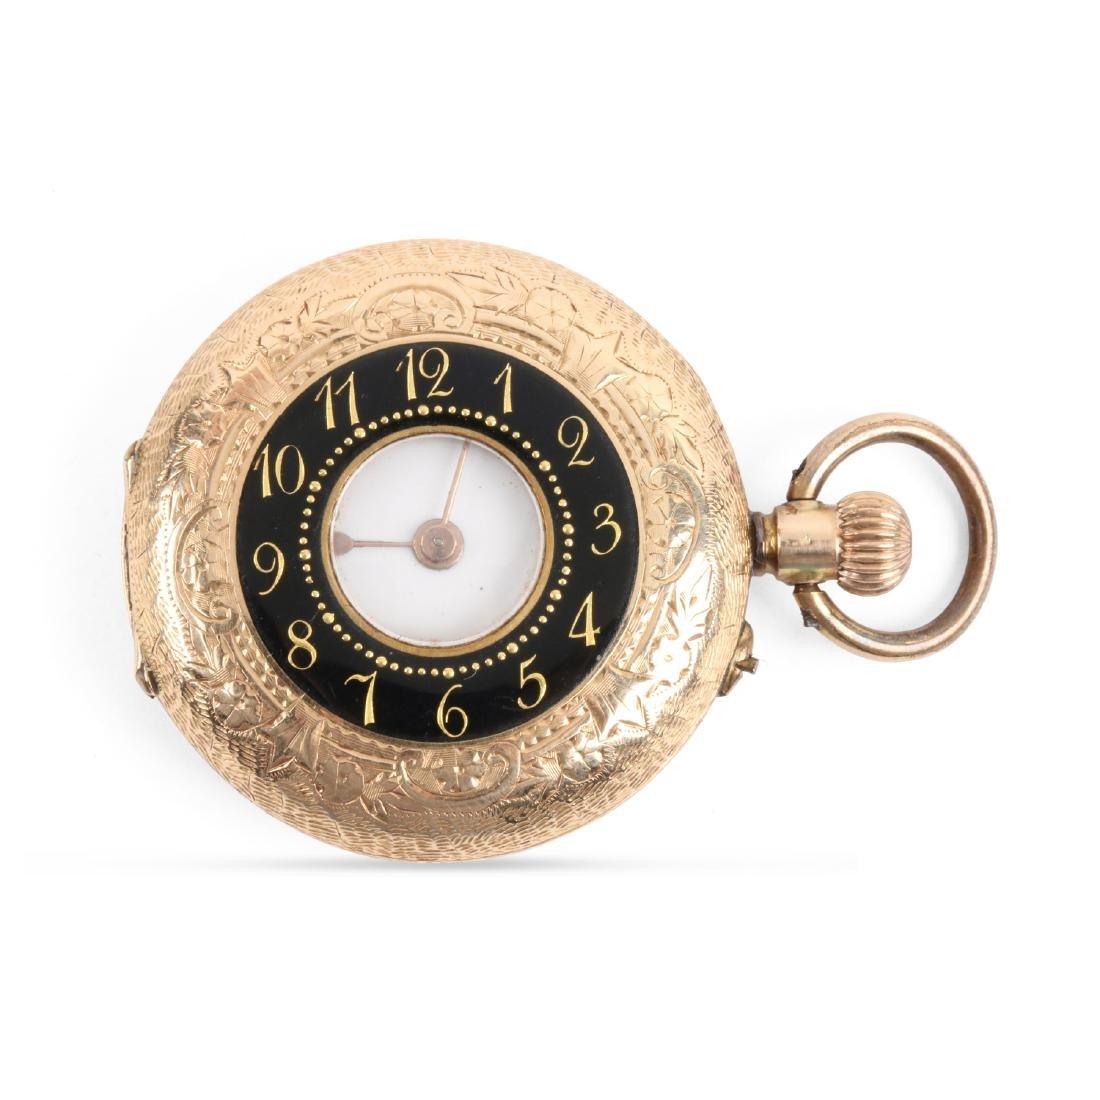 French, Lady's Enameled 14K Pocket Watch